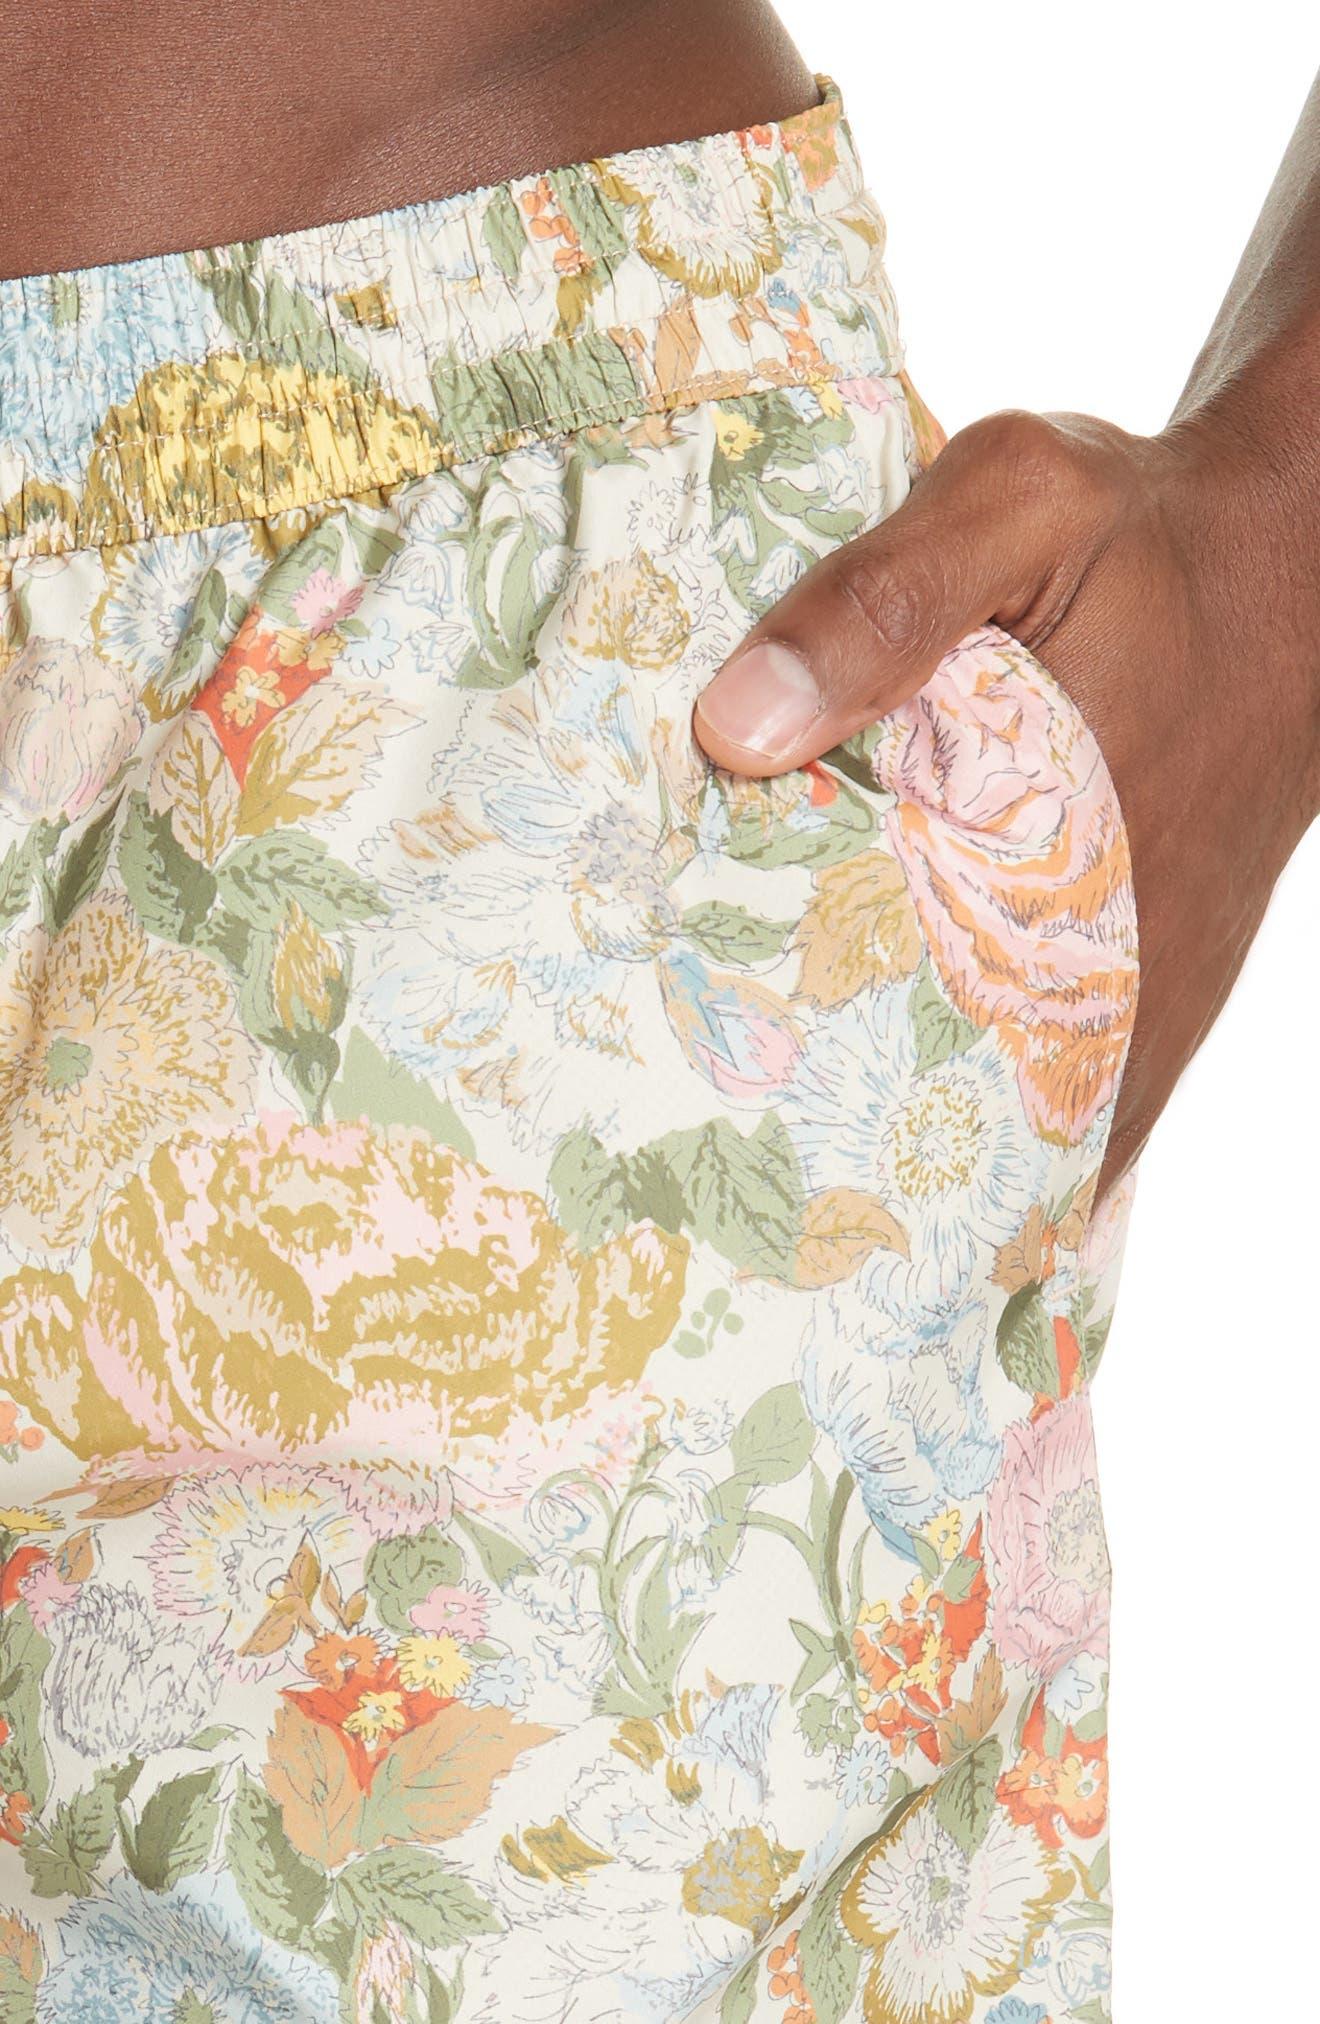 Guildes Floral Print Swim Trunks,                             Alternate thumbnail 4, color,                             800